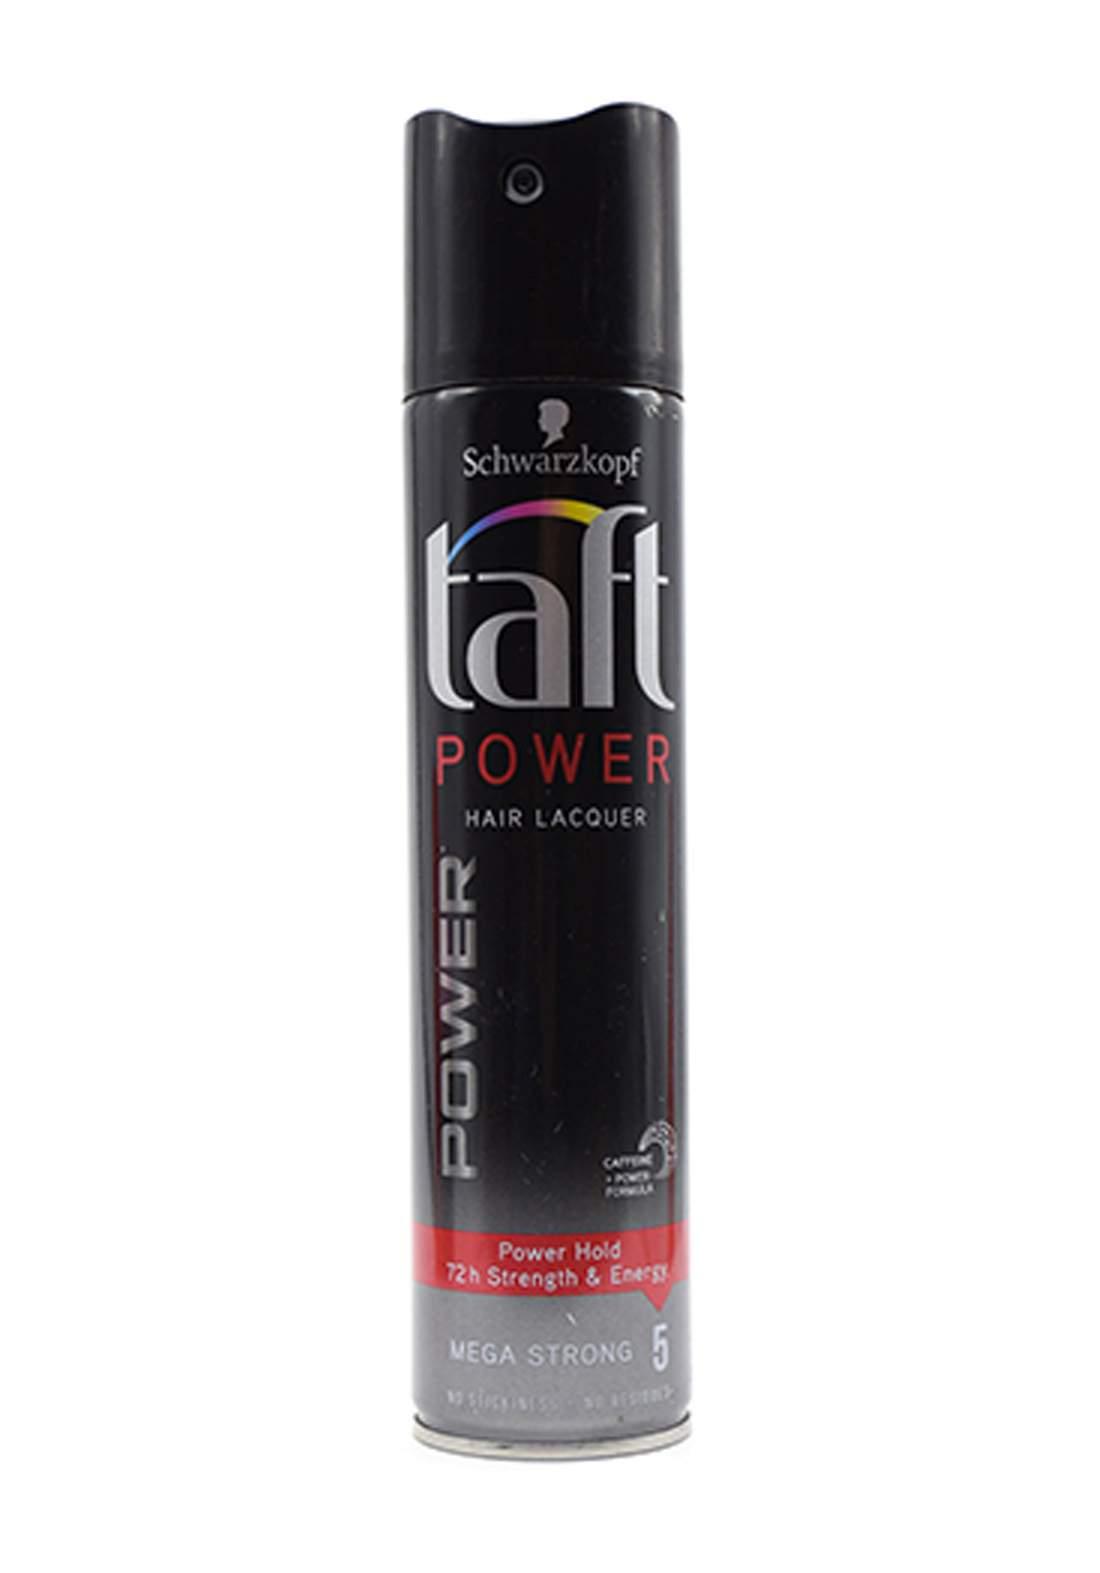 Schwarzkopf 3 Wetter Taft Hair Lacquer Power mega strong hold 5- 250 ml مثبت شعر